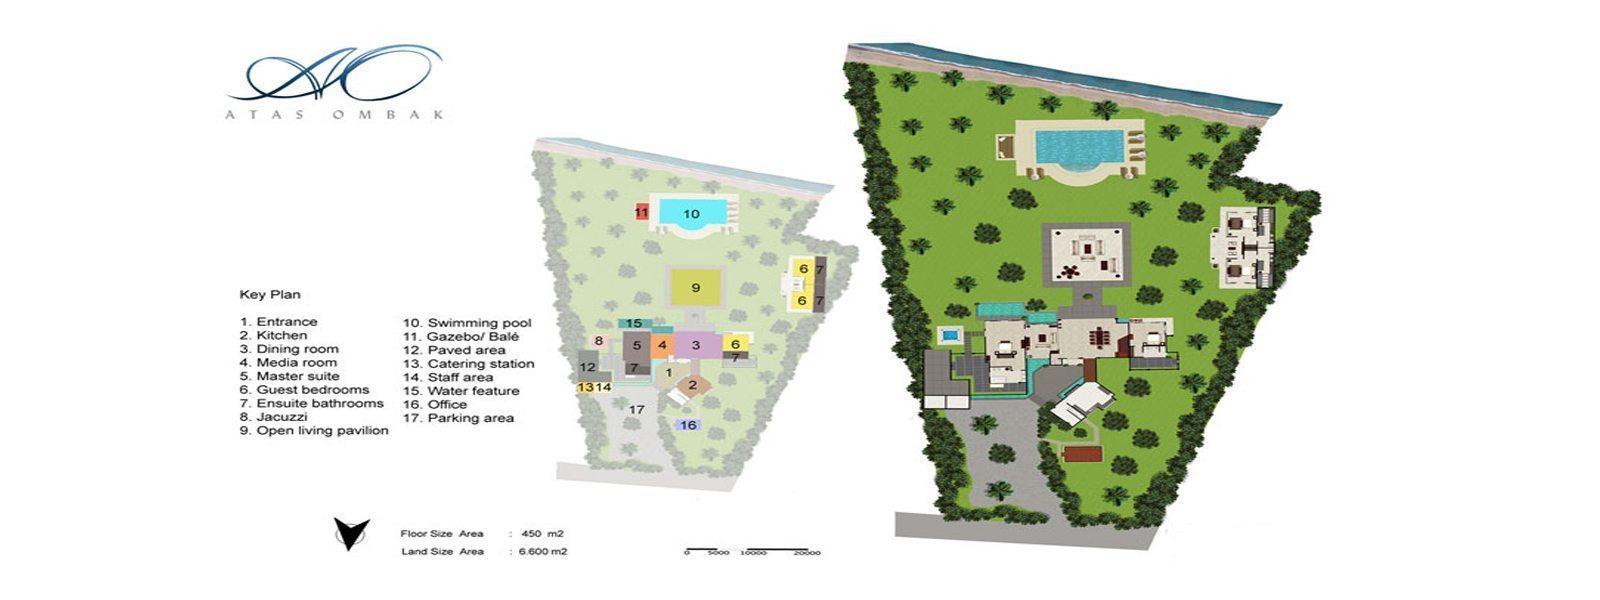 Villa Atas Ombak Floorplan | Batubelig, Bali